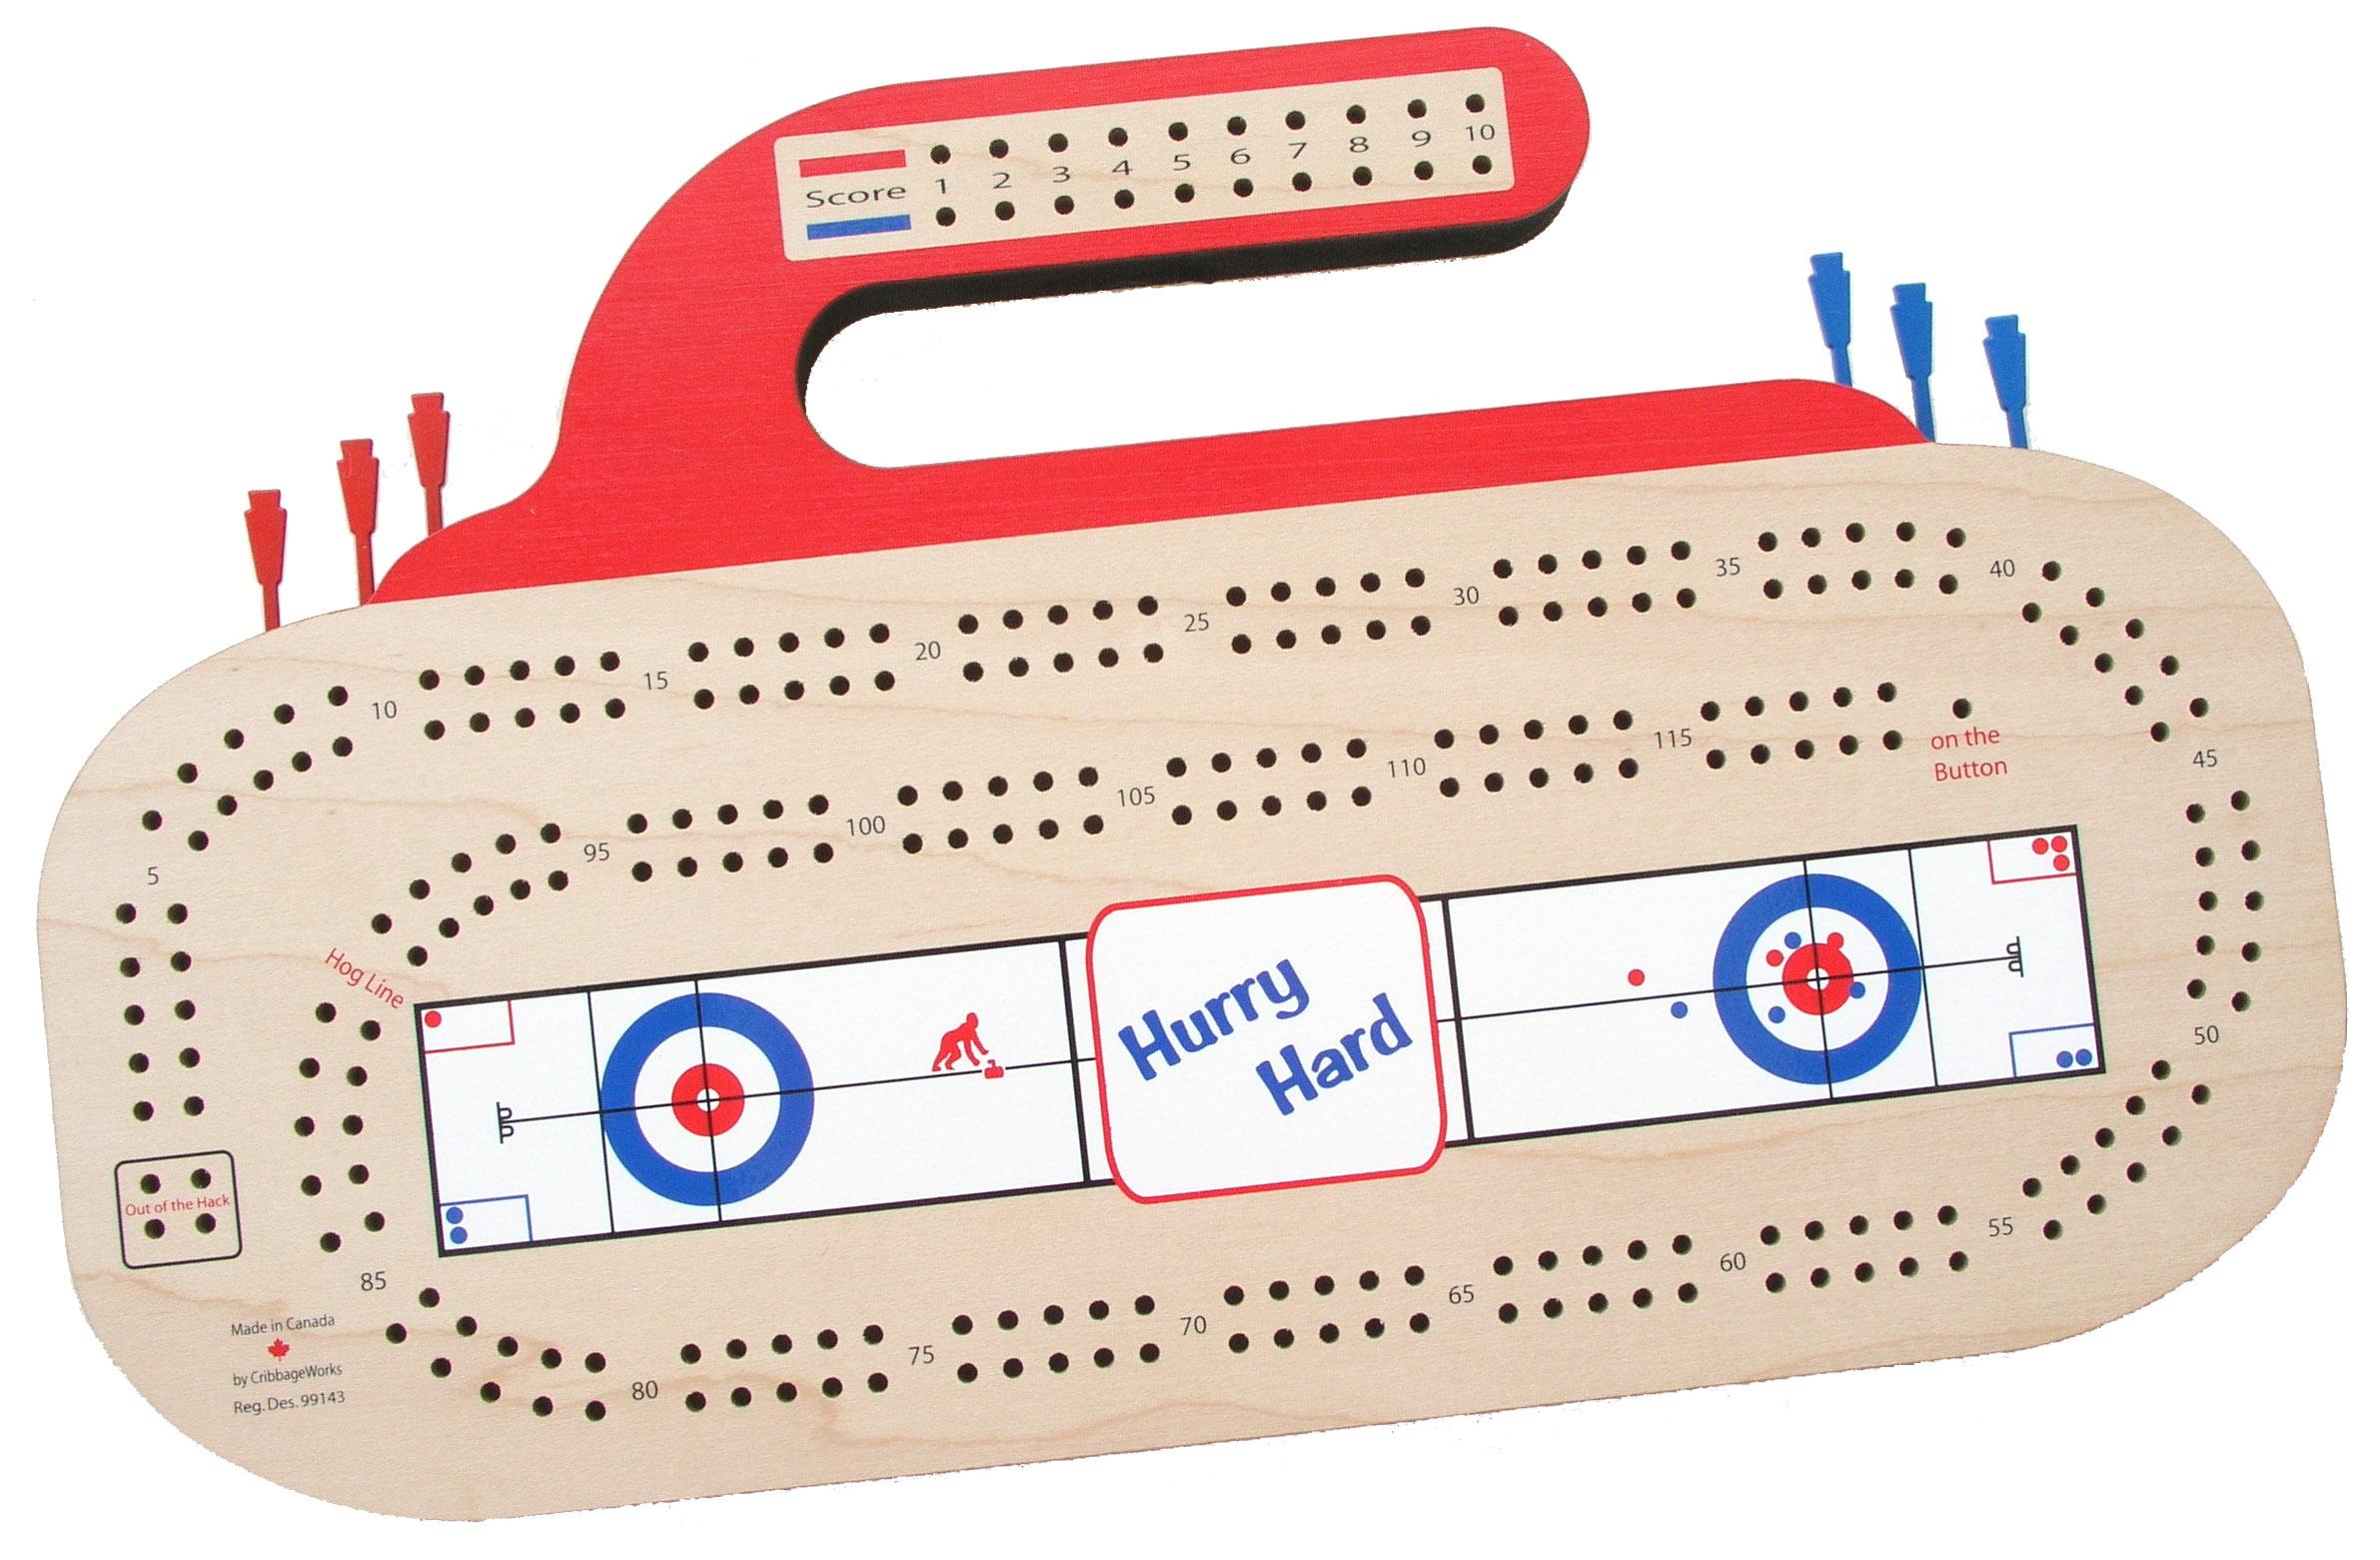 Curling Rock Crib Board Calgary S Curling Shop